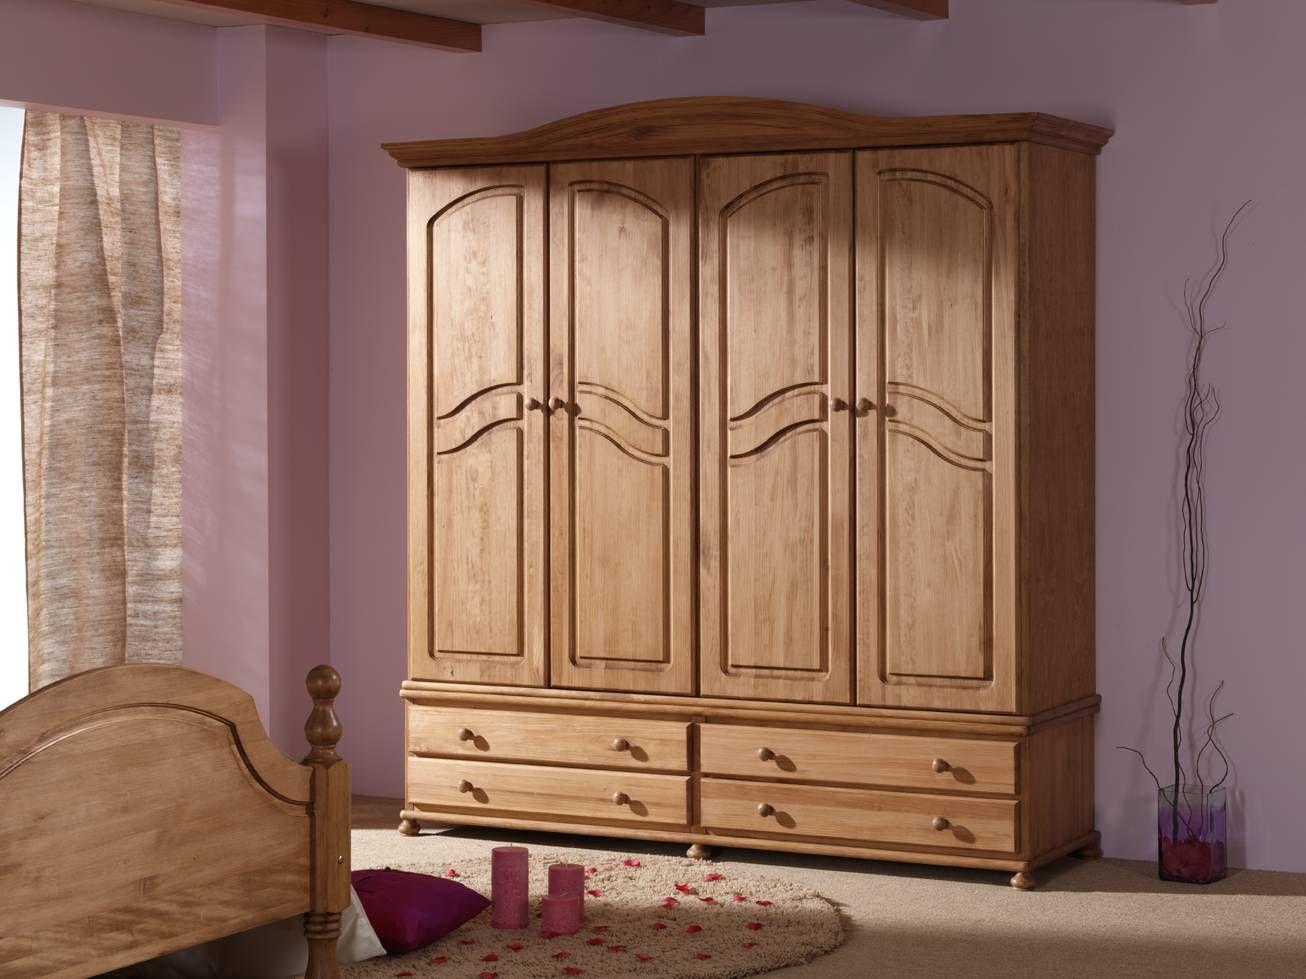 Roperos de madera hogar pinterest ropero de madera for Armarios roperos para habitaciones pequenas